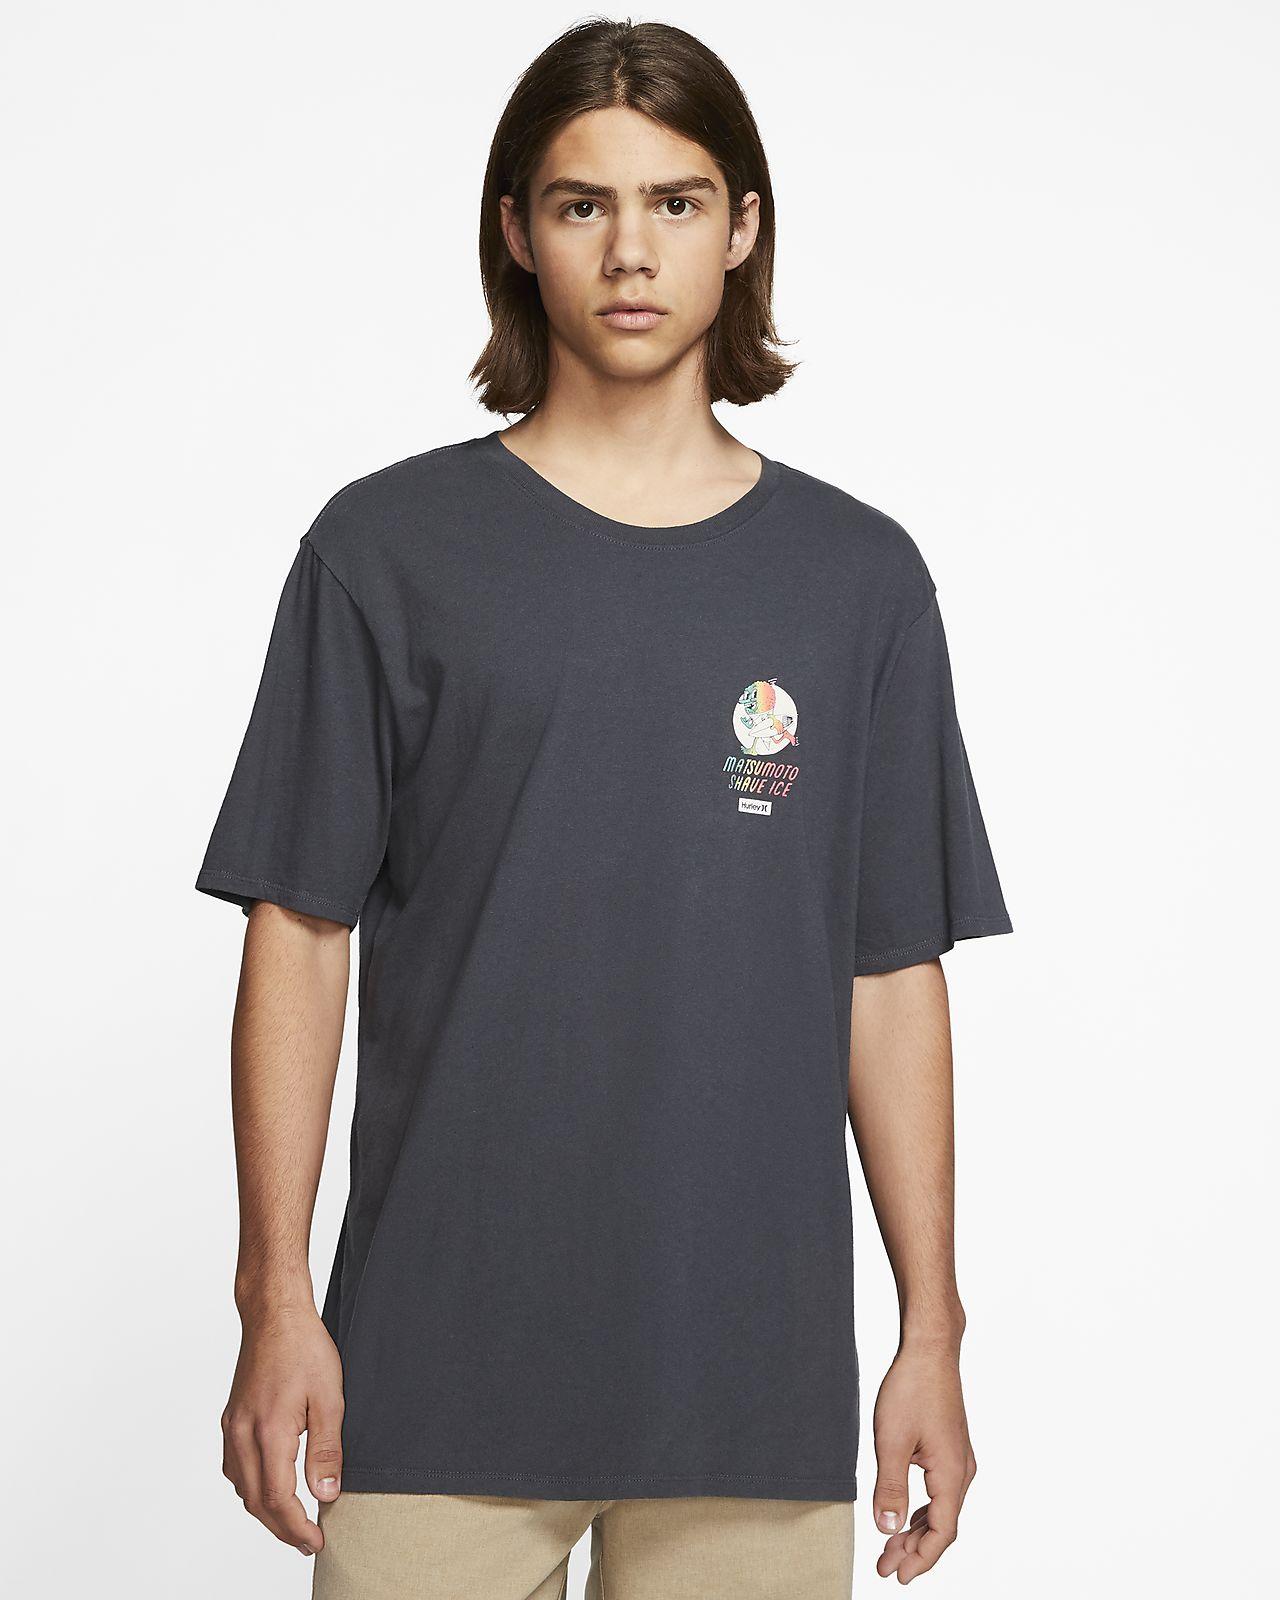 Hurley x Matsumoto Shave Ice Camiseta - Hombre